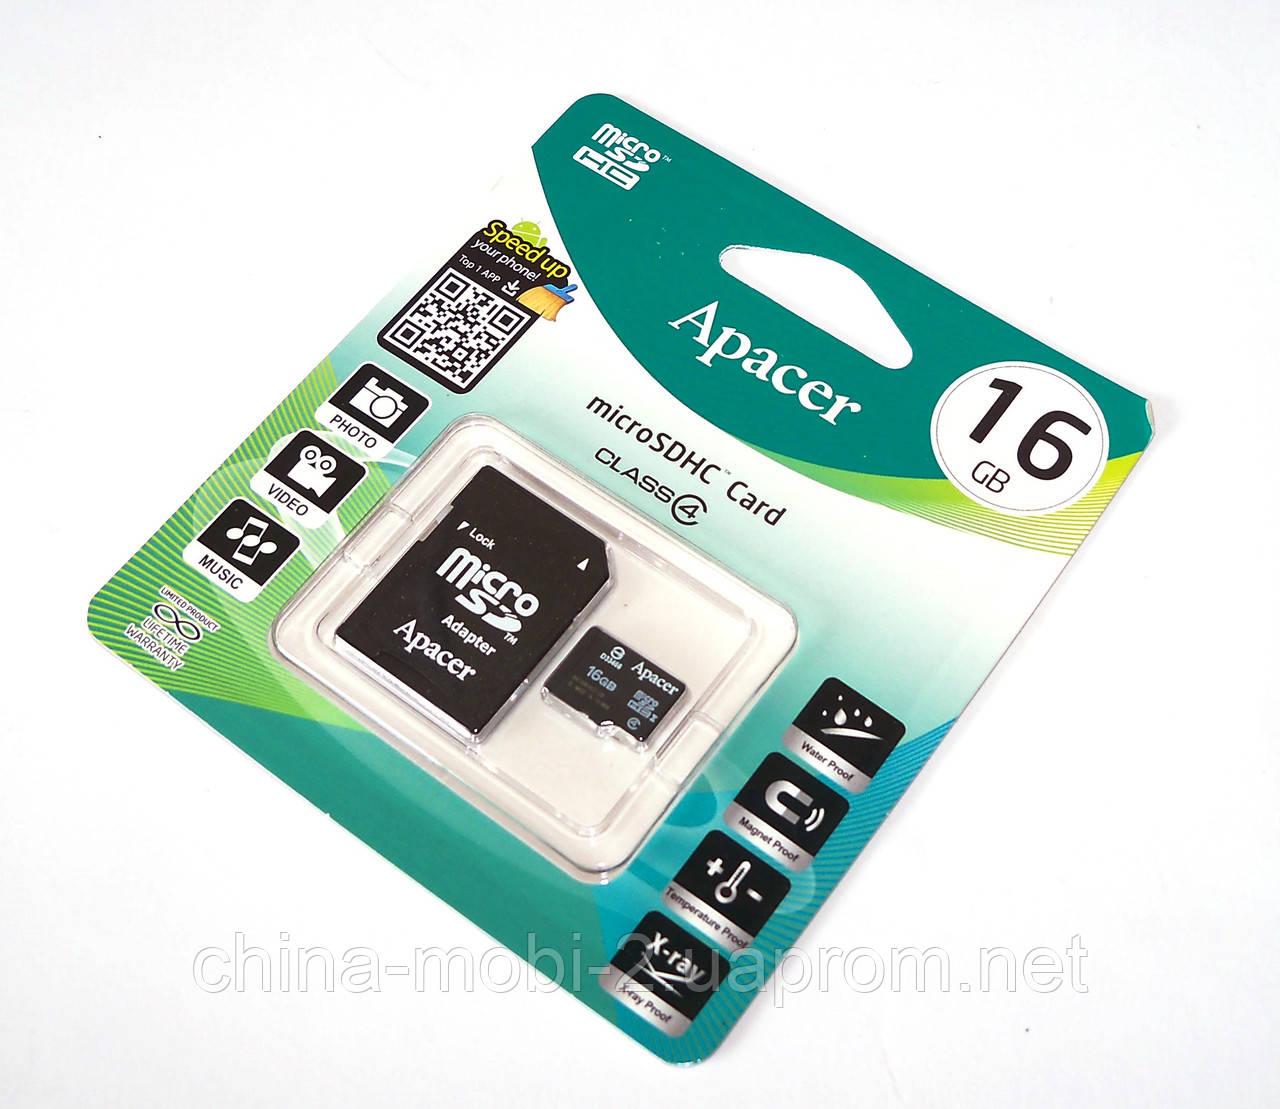 Карта памяти 16ГБ microSDHC Apacer 16Gb class 4 + SD adapter (флешка microSDTF)